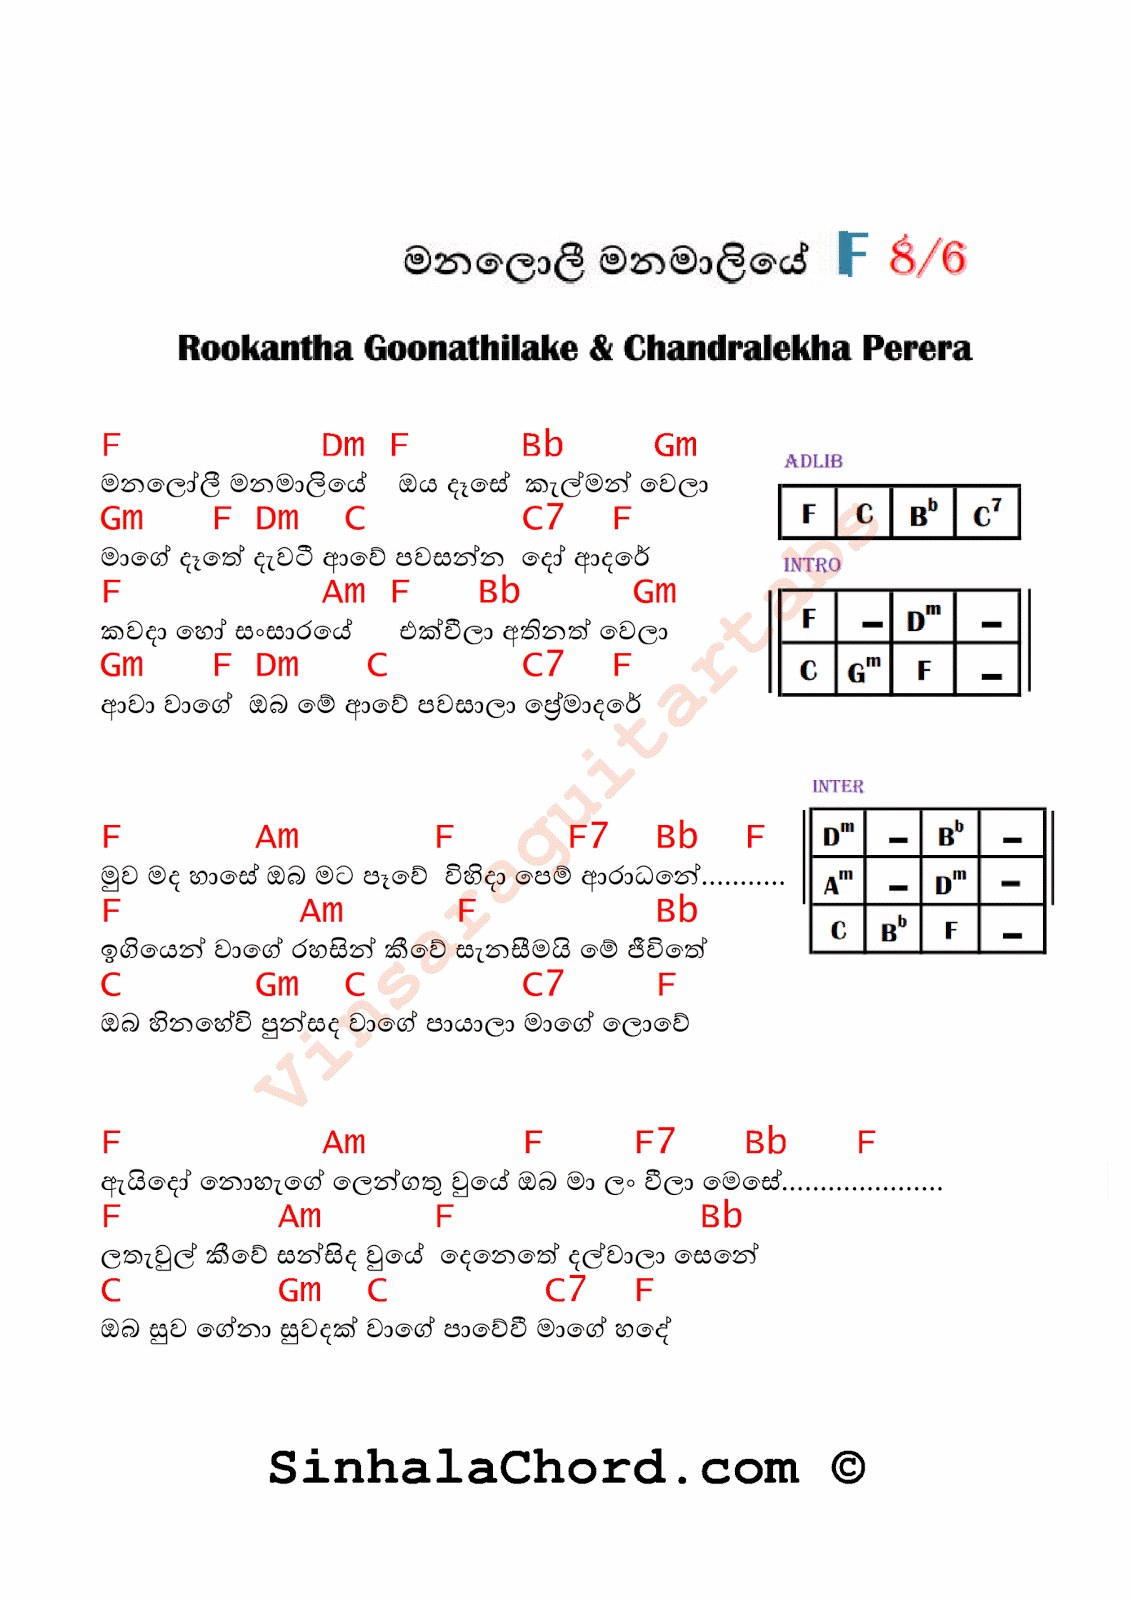 Manaloli Manamaliye Guitar Chords with Lyrics - Sinhala Guitar Lessons with Tabs and Chords